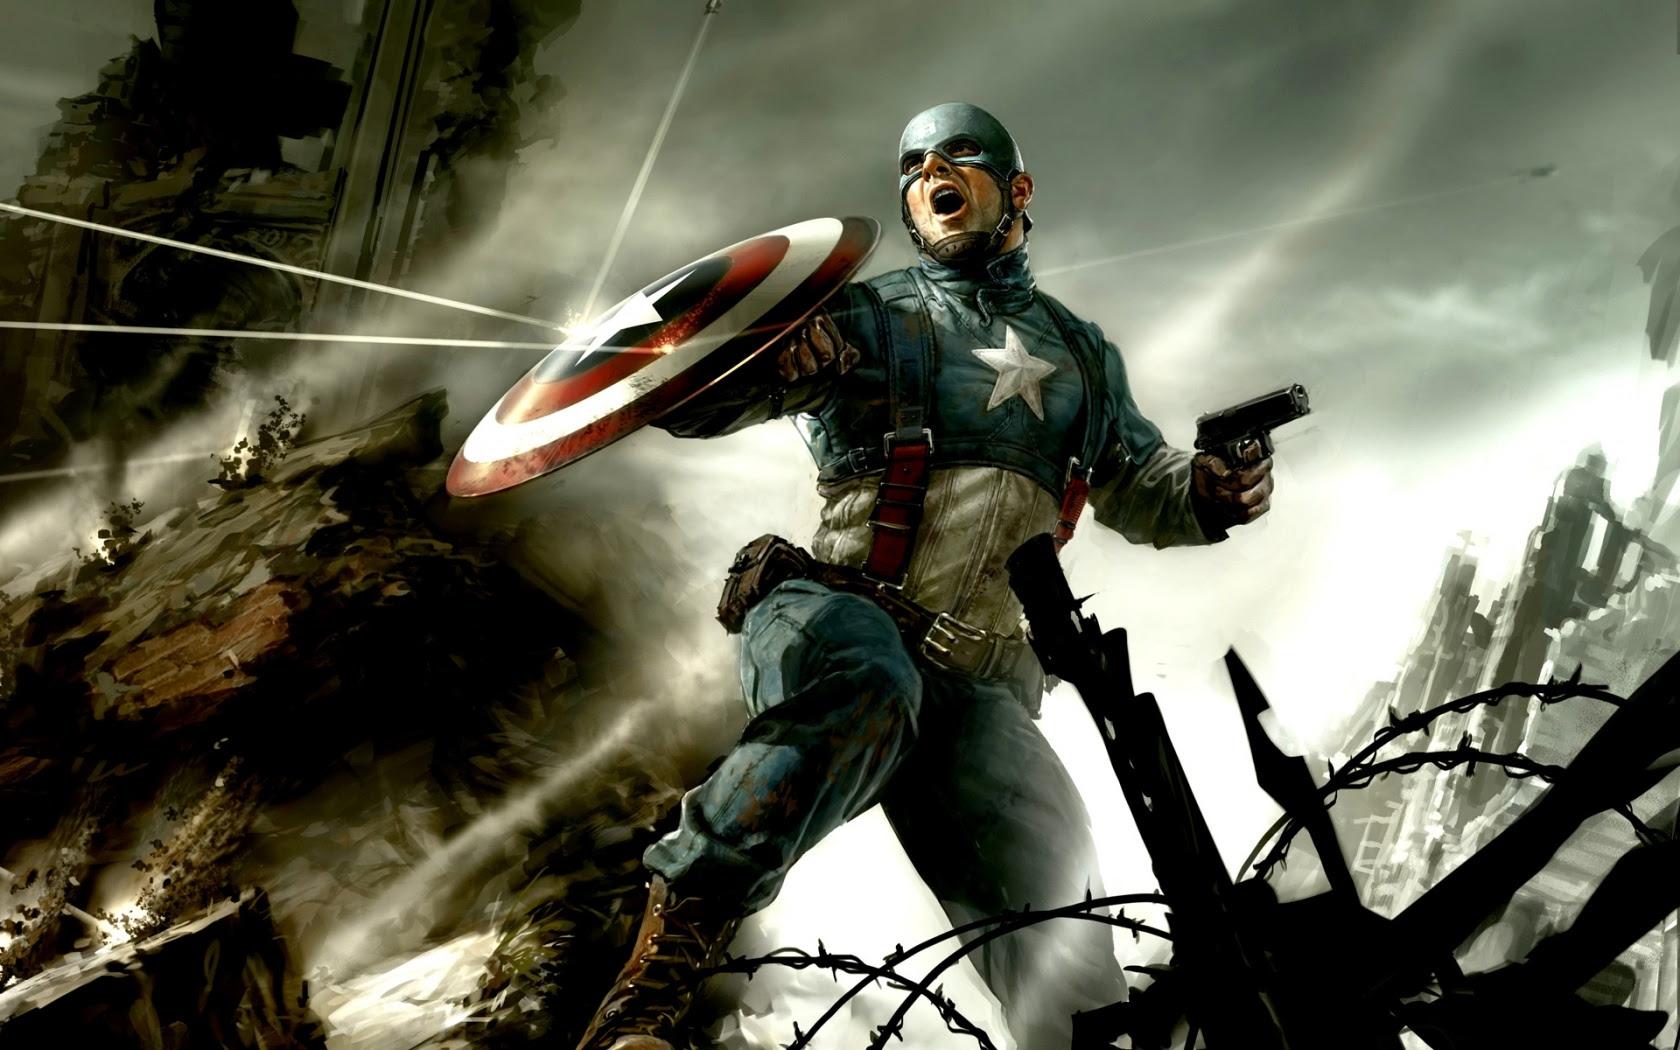 Captain America Concept Art